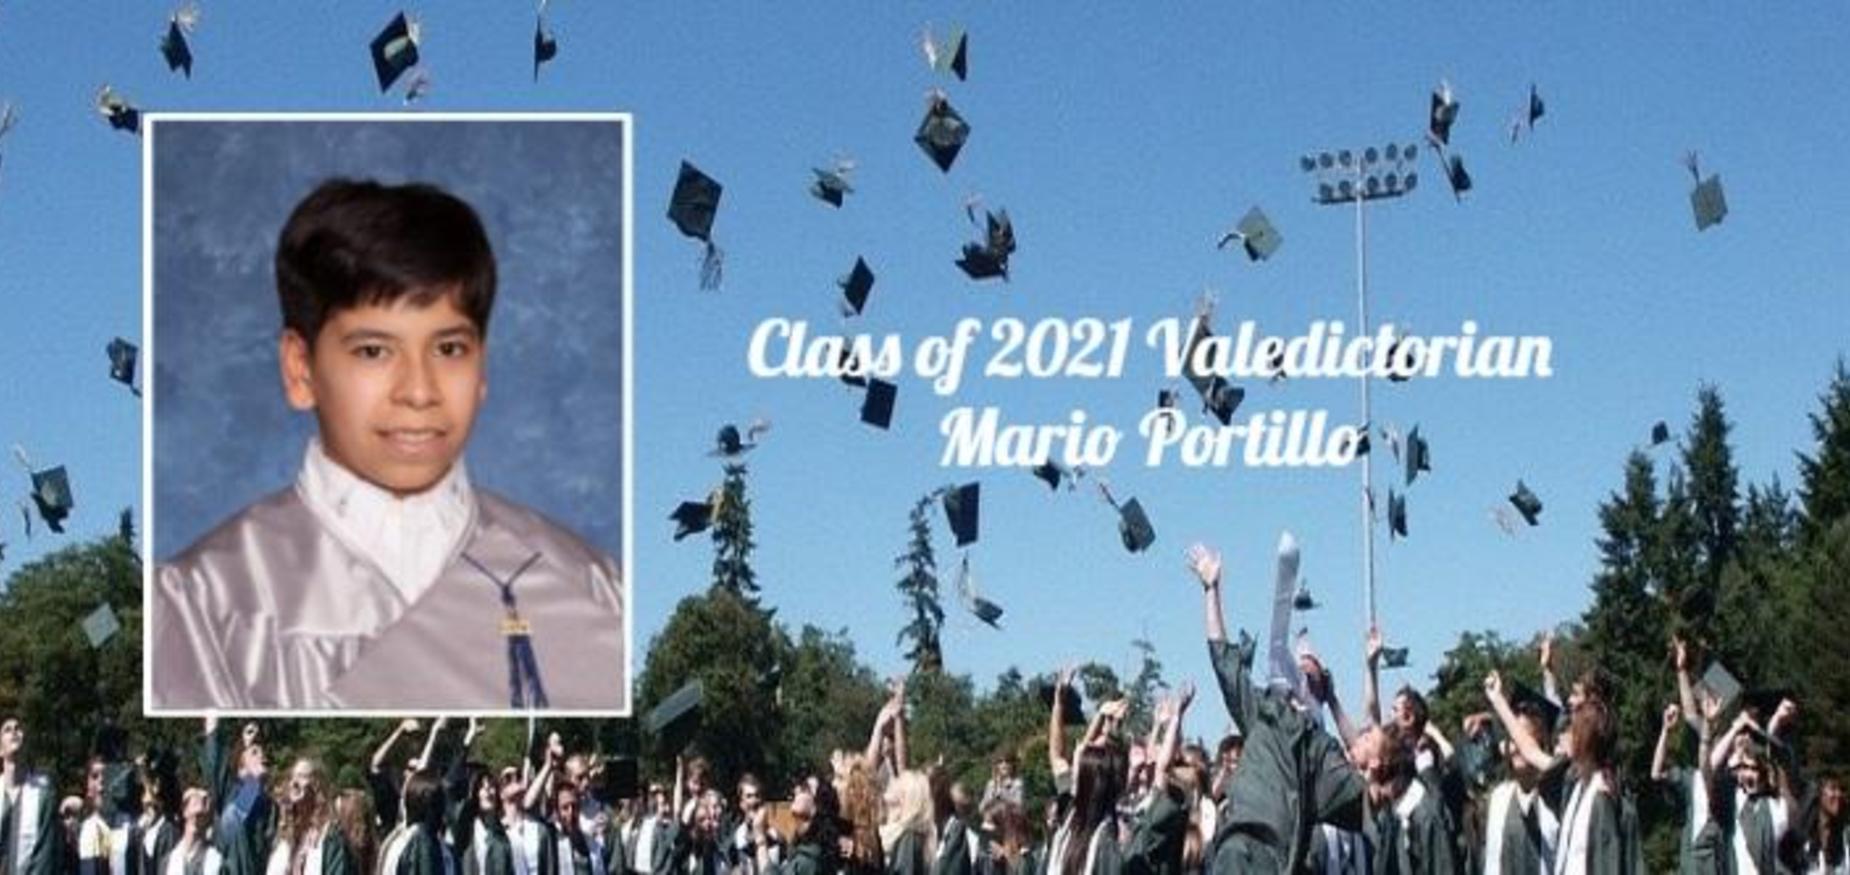 congratulations valedictorian